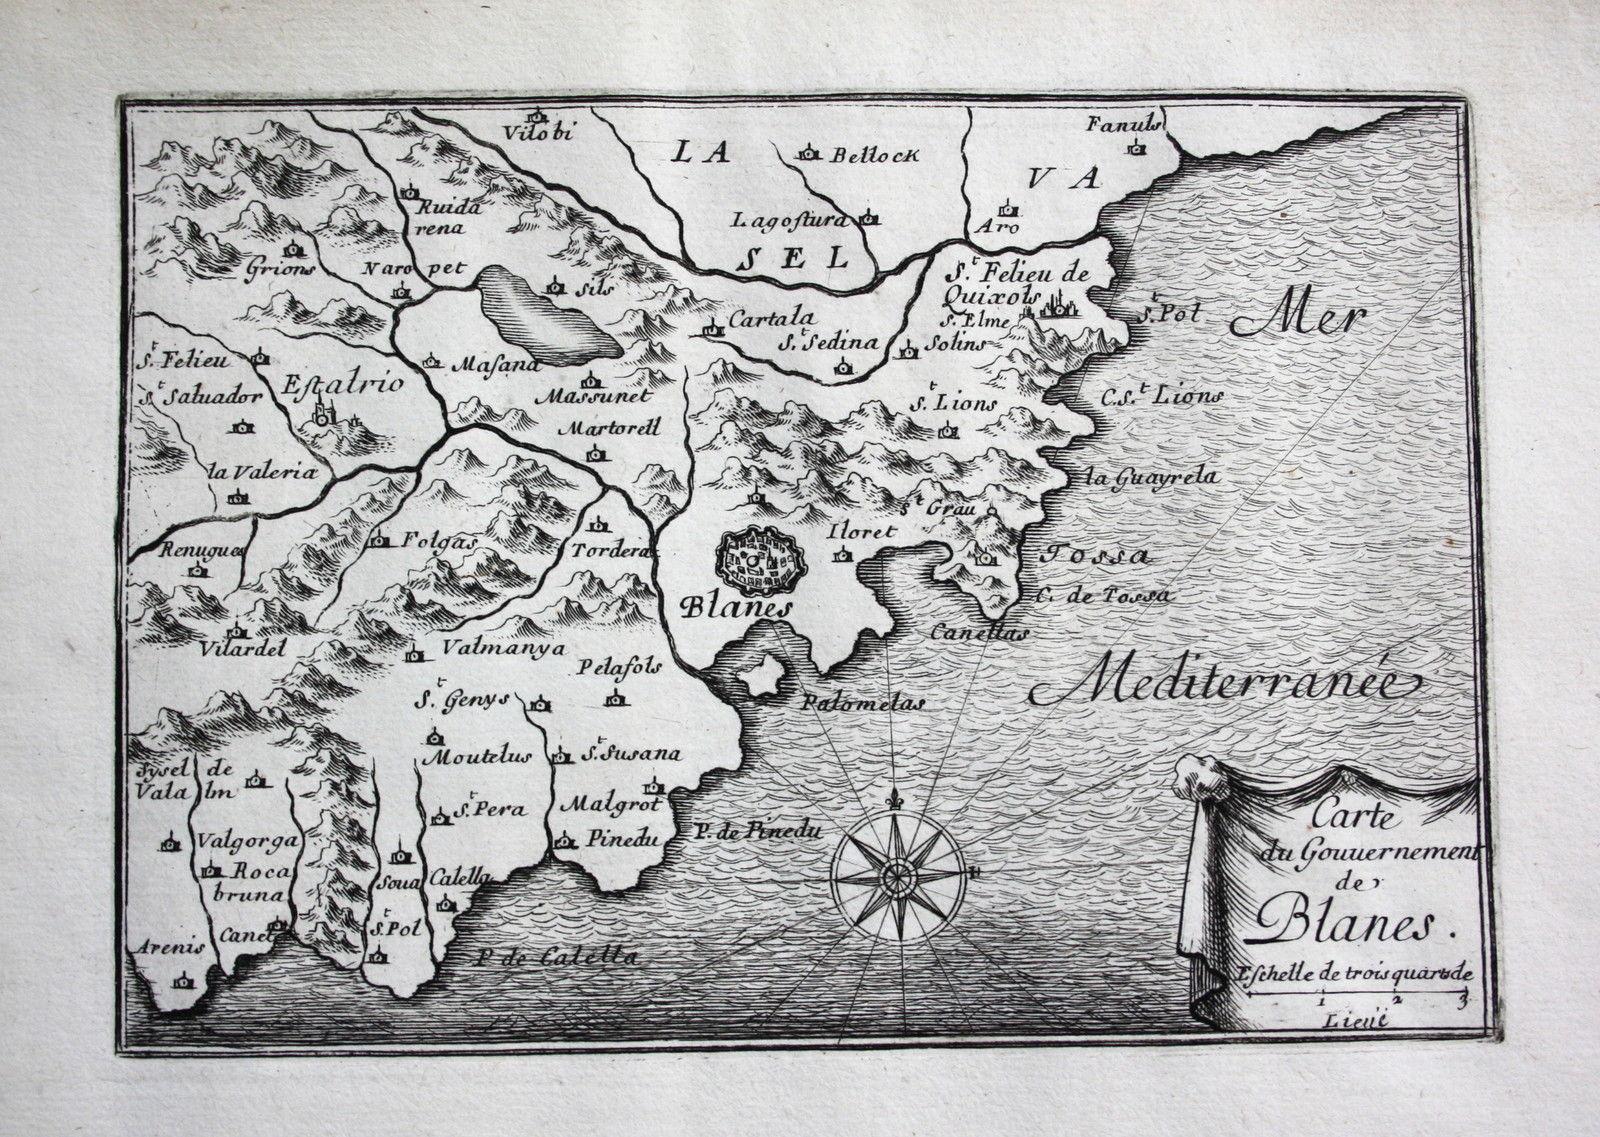 Carte Espagne Costa Brava Blanes.Blanes Costa Brava Spanien Espana Karte Map